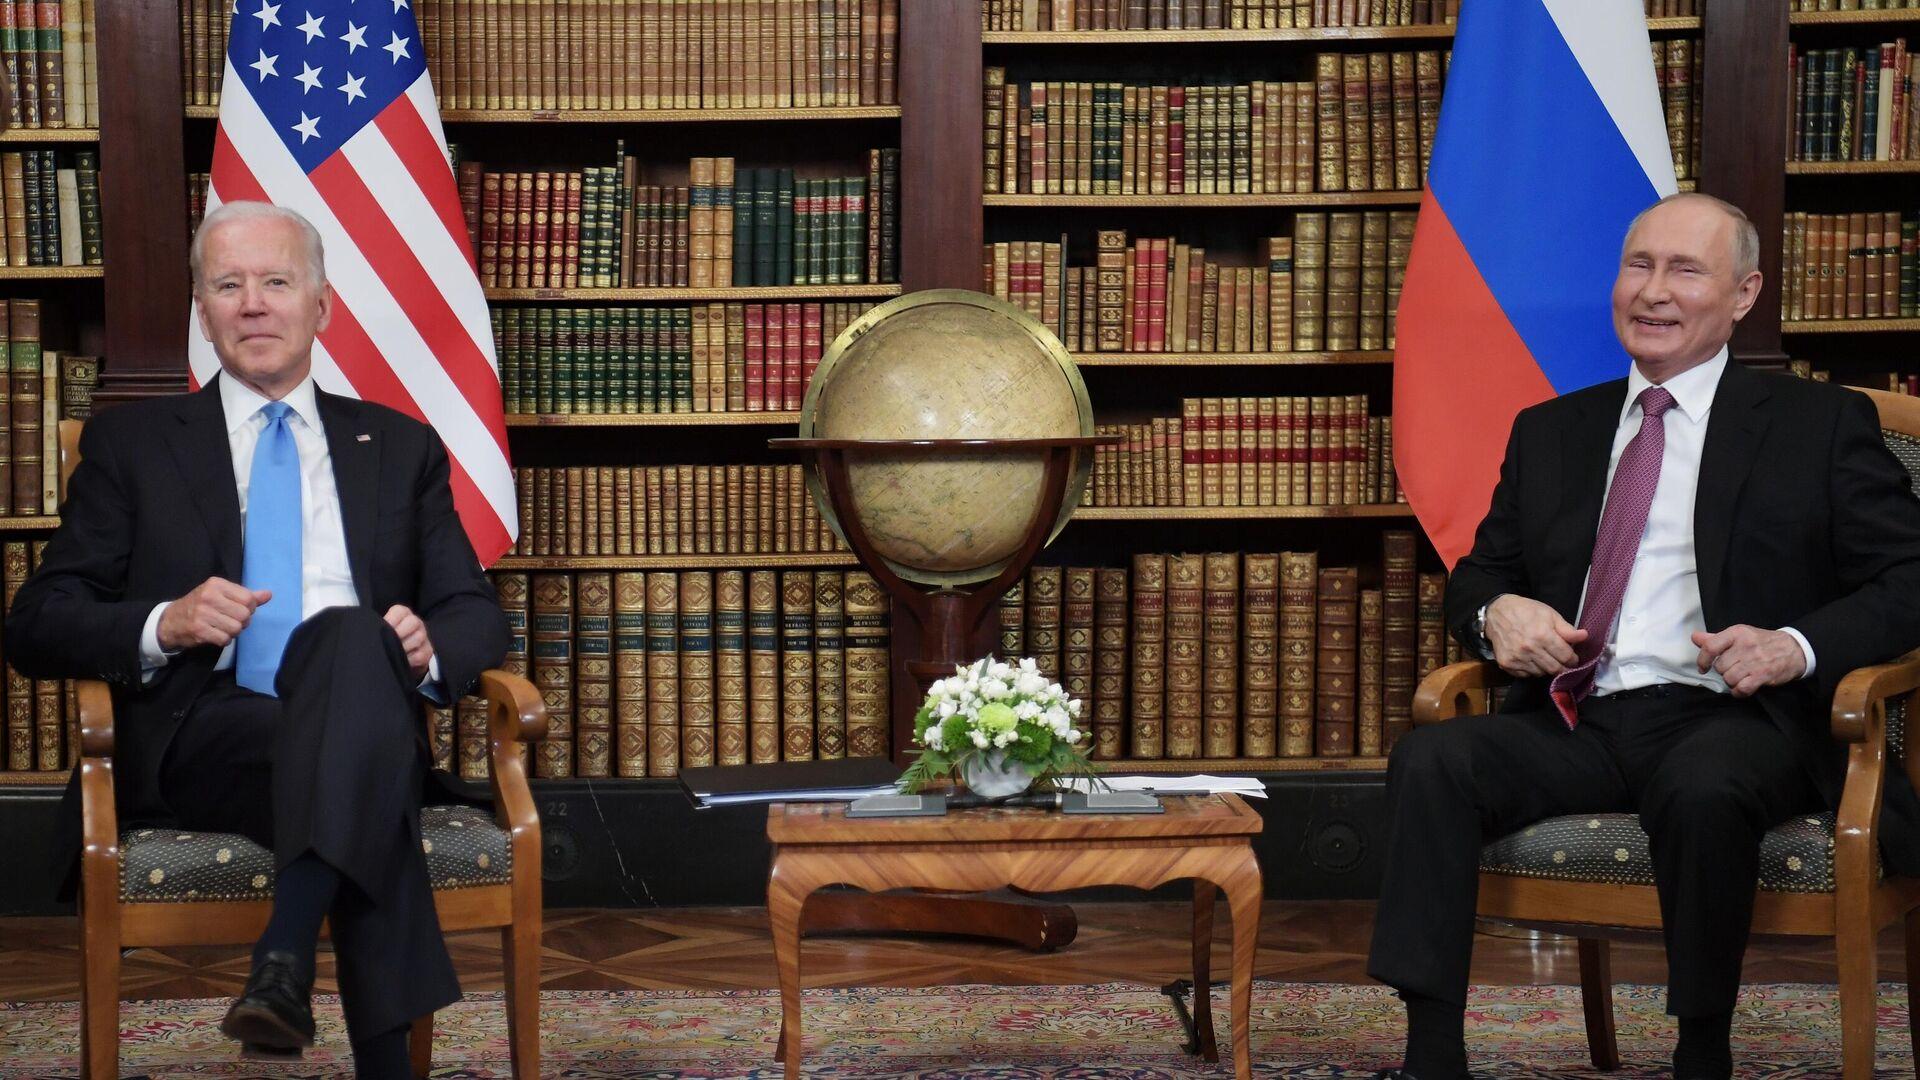 L'incontro bilaterale tra Putin e Biden a Ginevra - Sputnik Italia, 1920, 18.09.2021